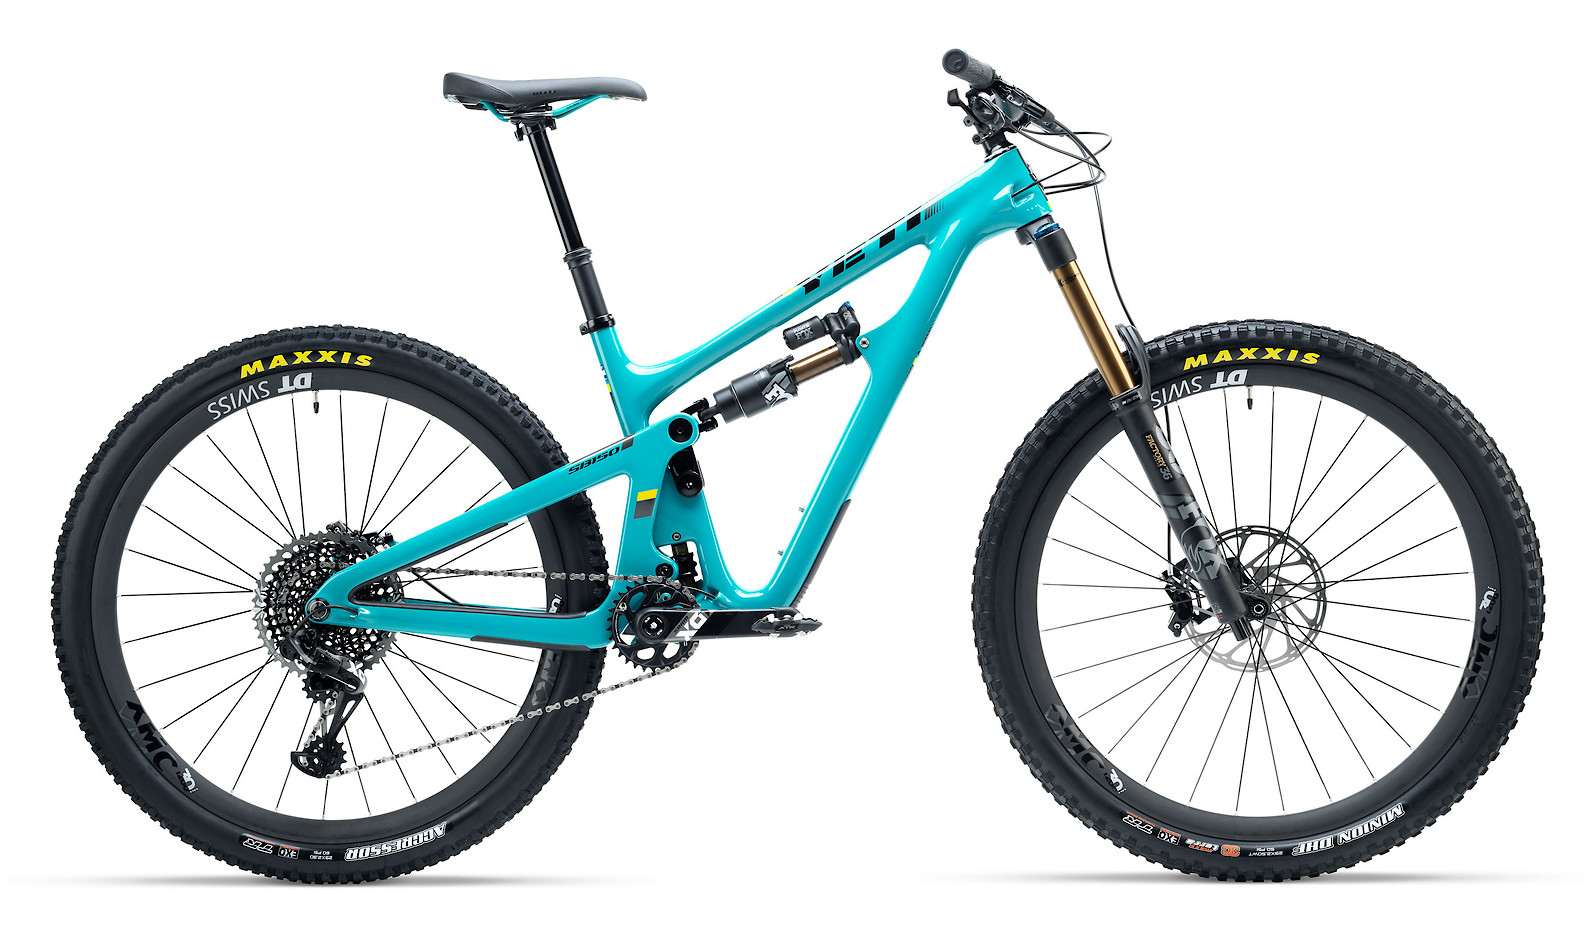 2019 Yeti SB150 (Turquoise) - shown with X01 Race kit